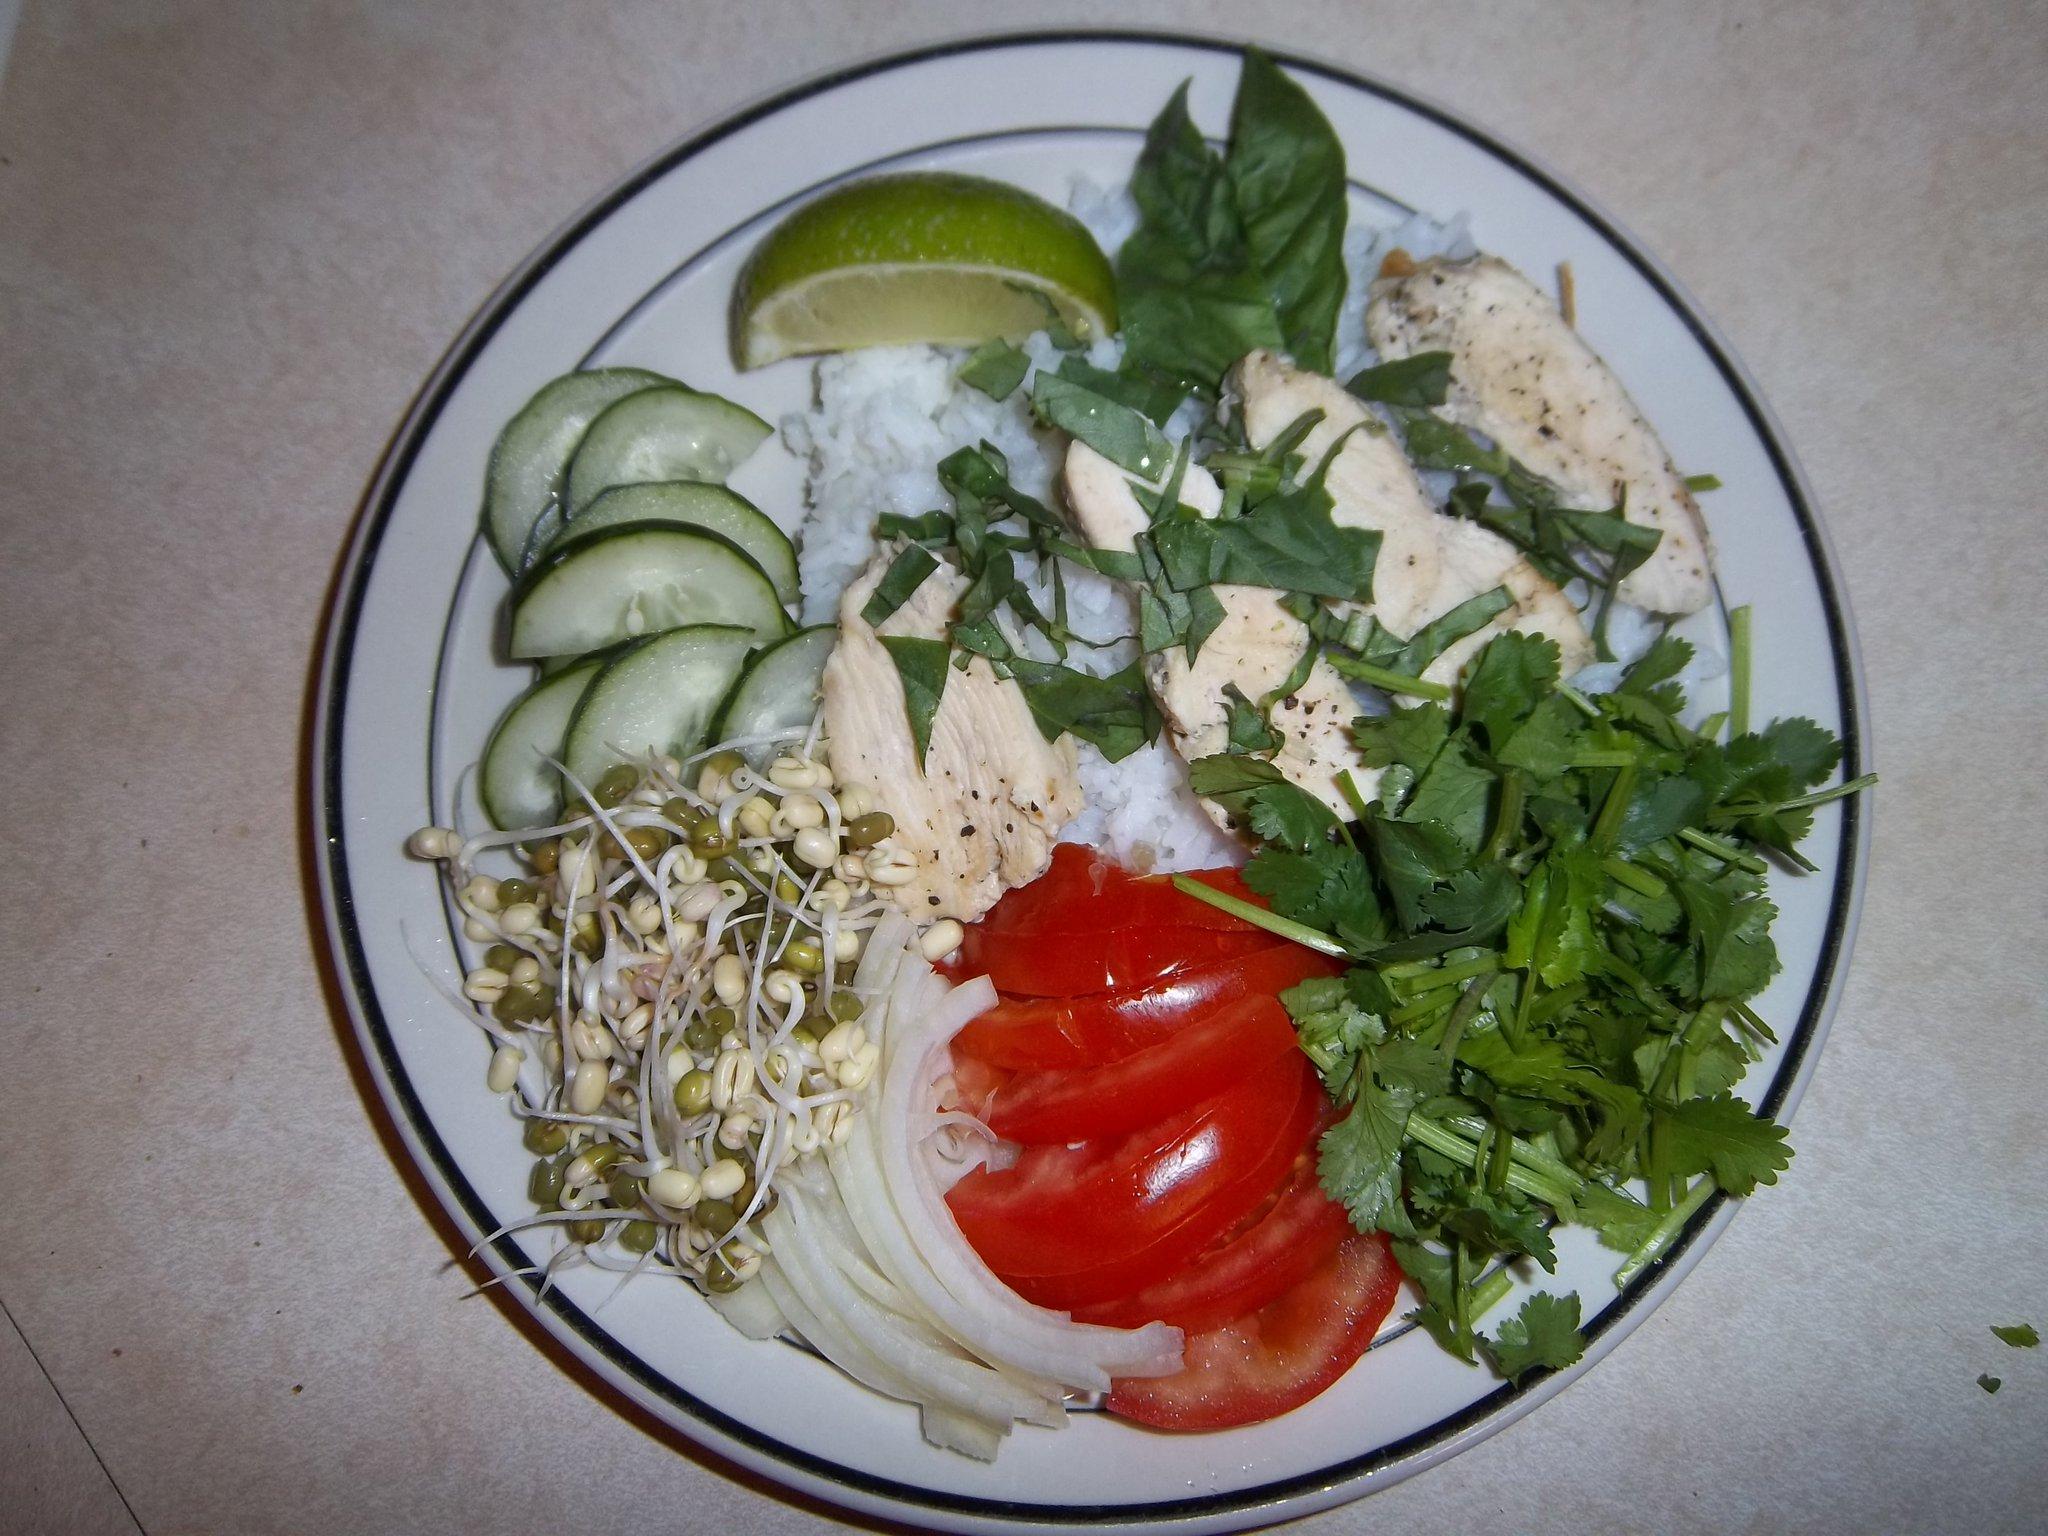 Basil Chicken with veggies